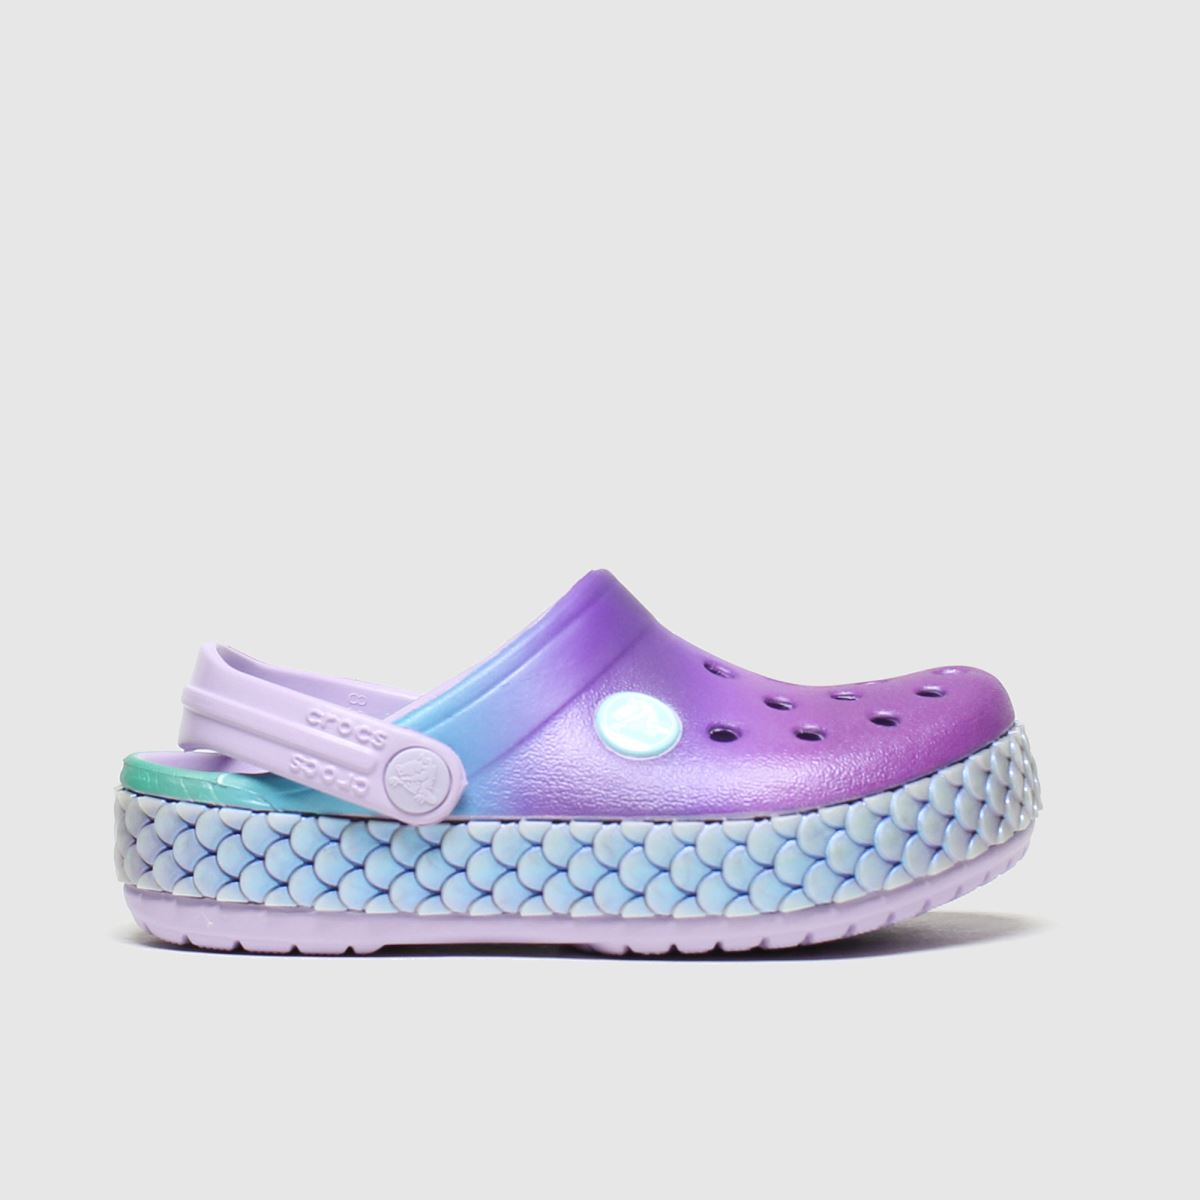 Crocs Purple Crocband Mermaid Trainers Toddler